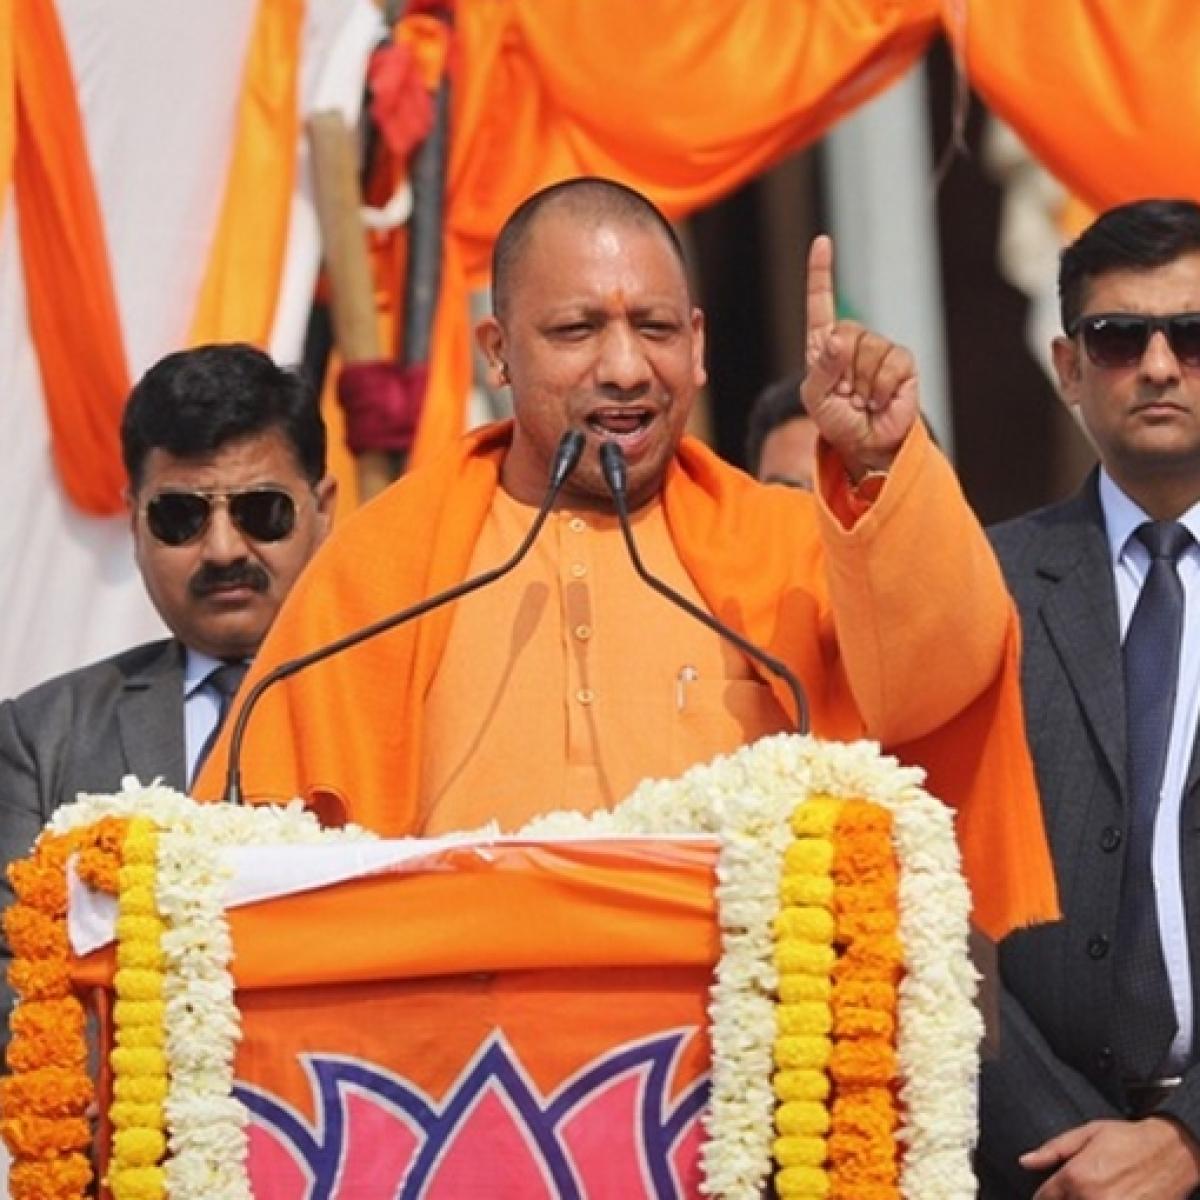 Yogi Adityanath to take stock of preparations in Ayodhya ahead of Ram Mandir's Bhoomi Pujan on August 5